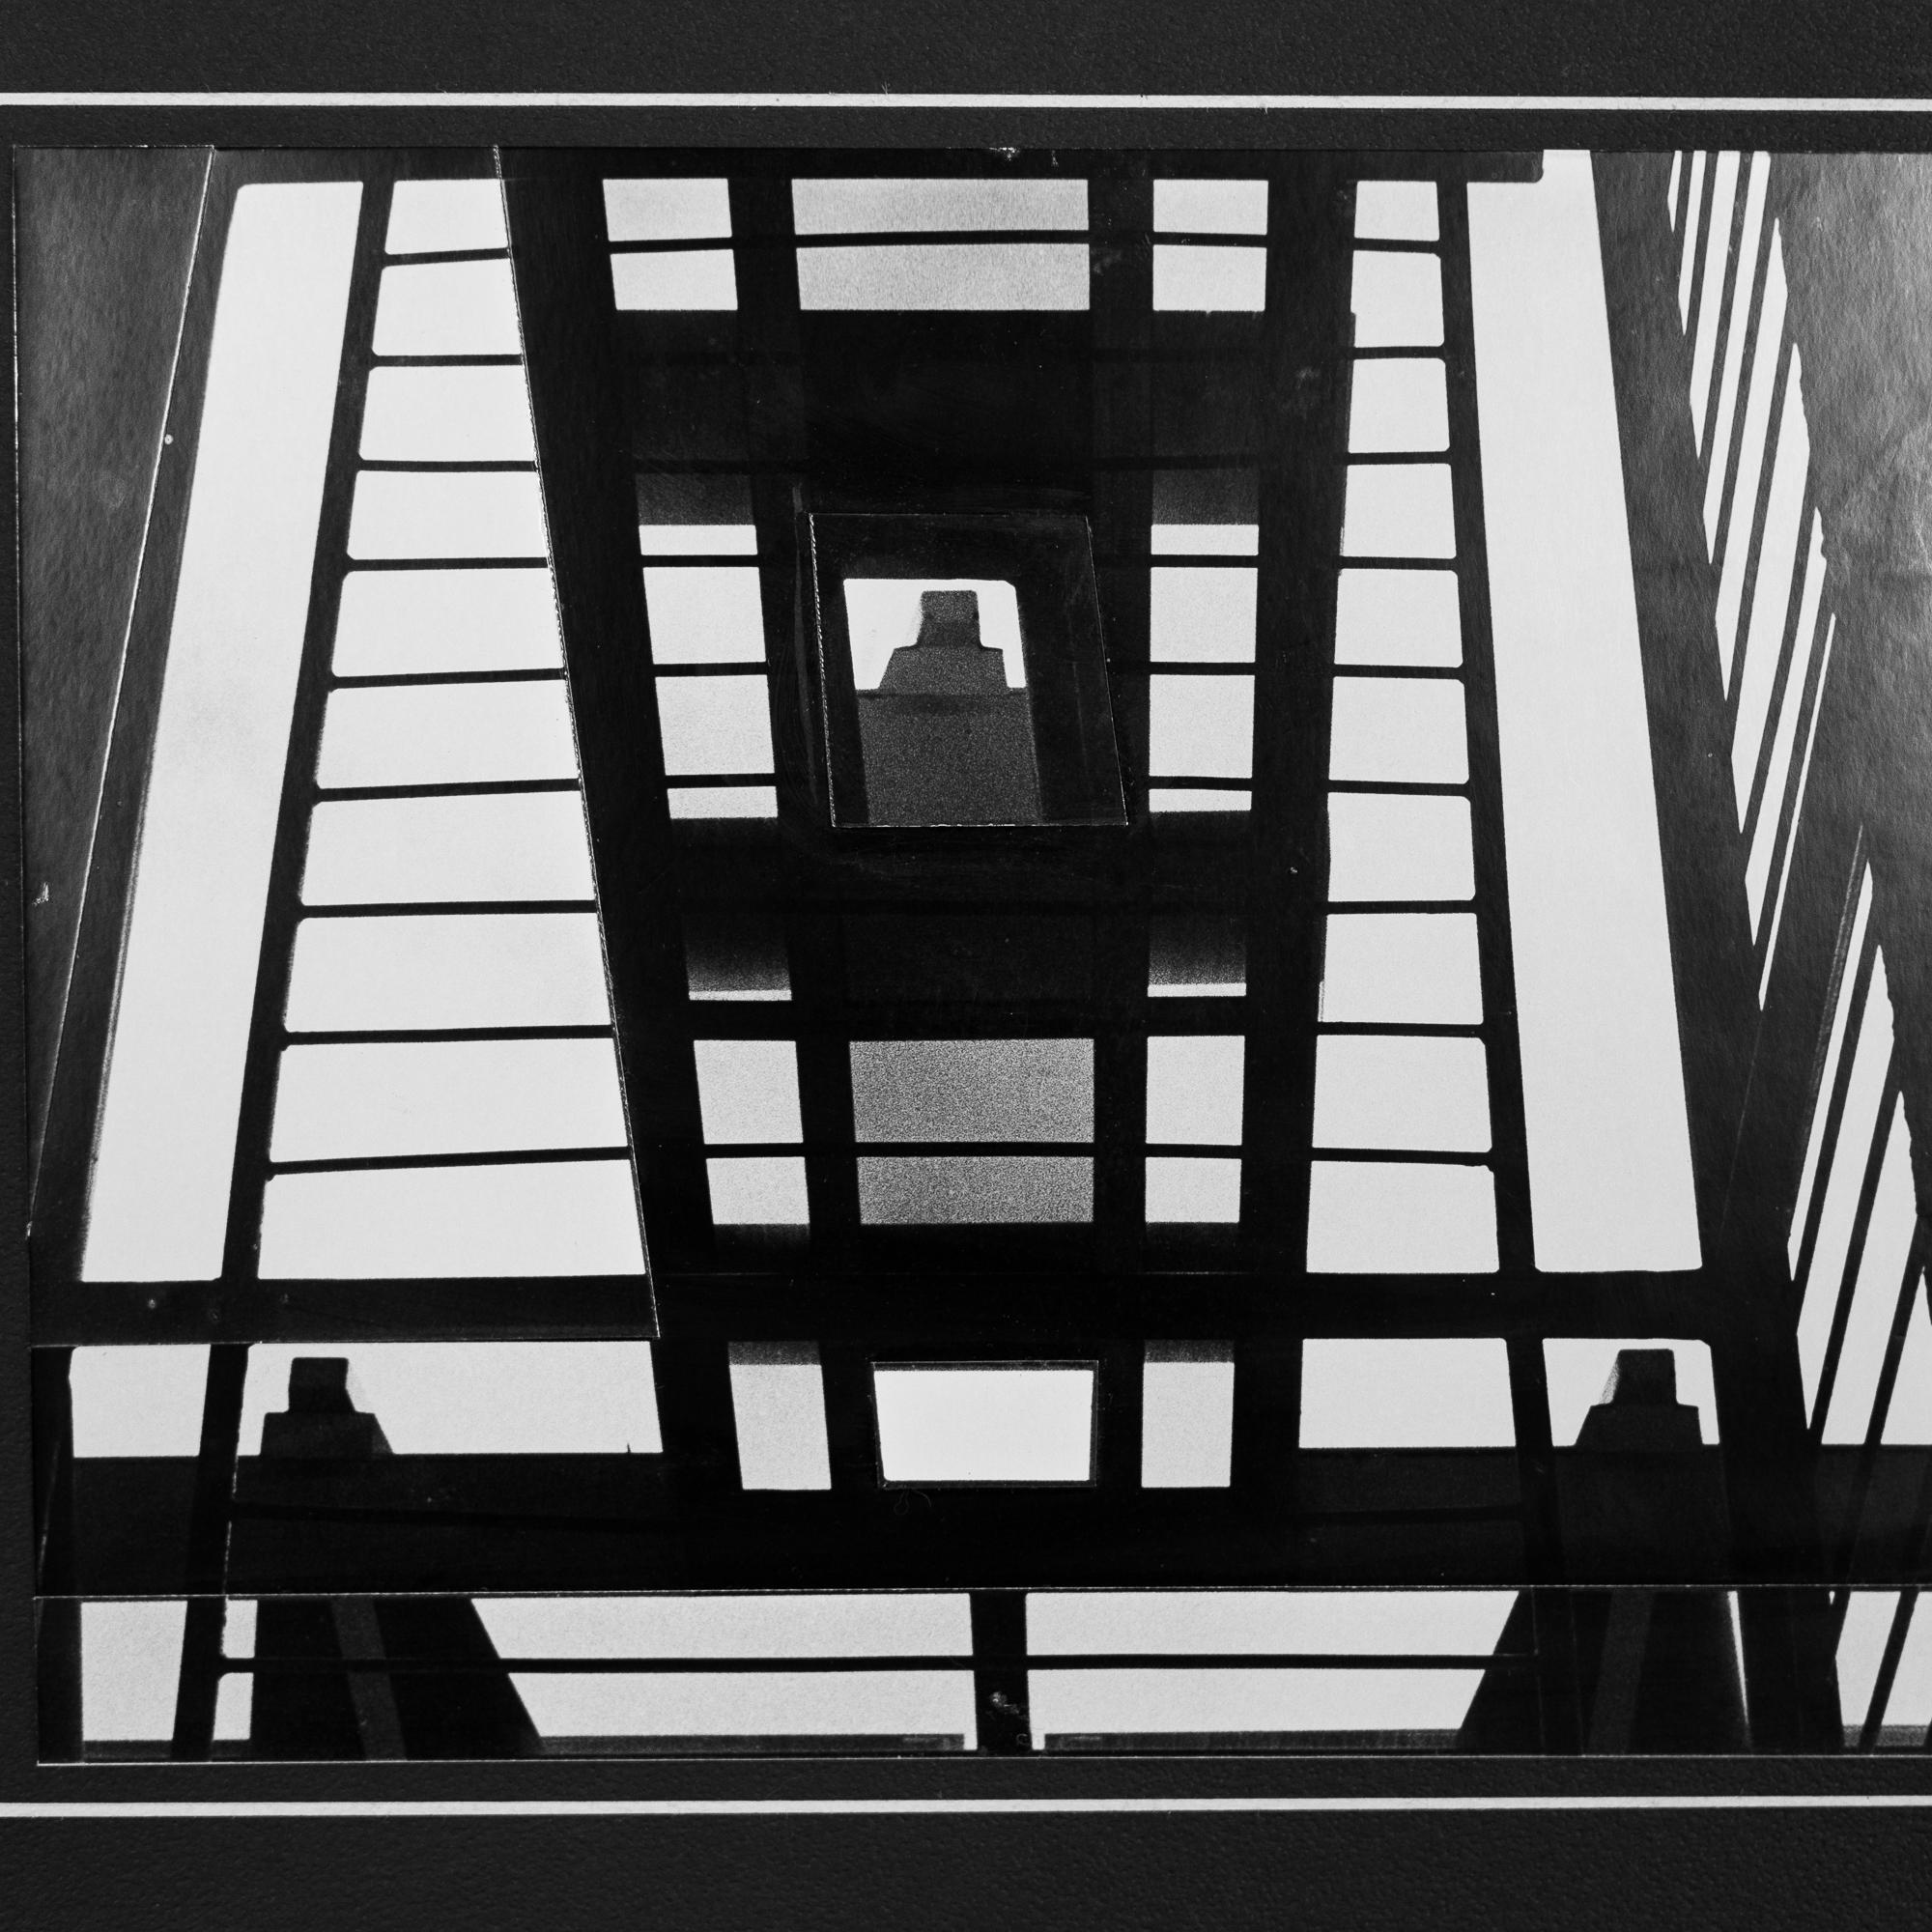 The_Urban_Wild_NZ_The_Upstairs_Gallery_Octoberuntitled shoot-20171015-008-2.jpg